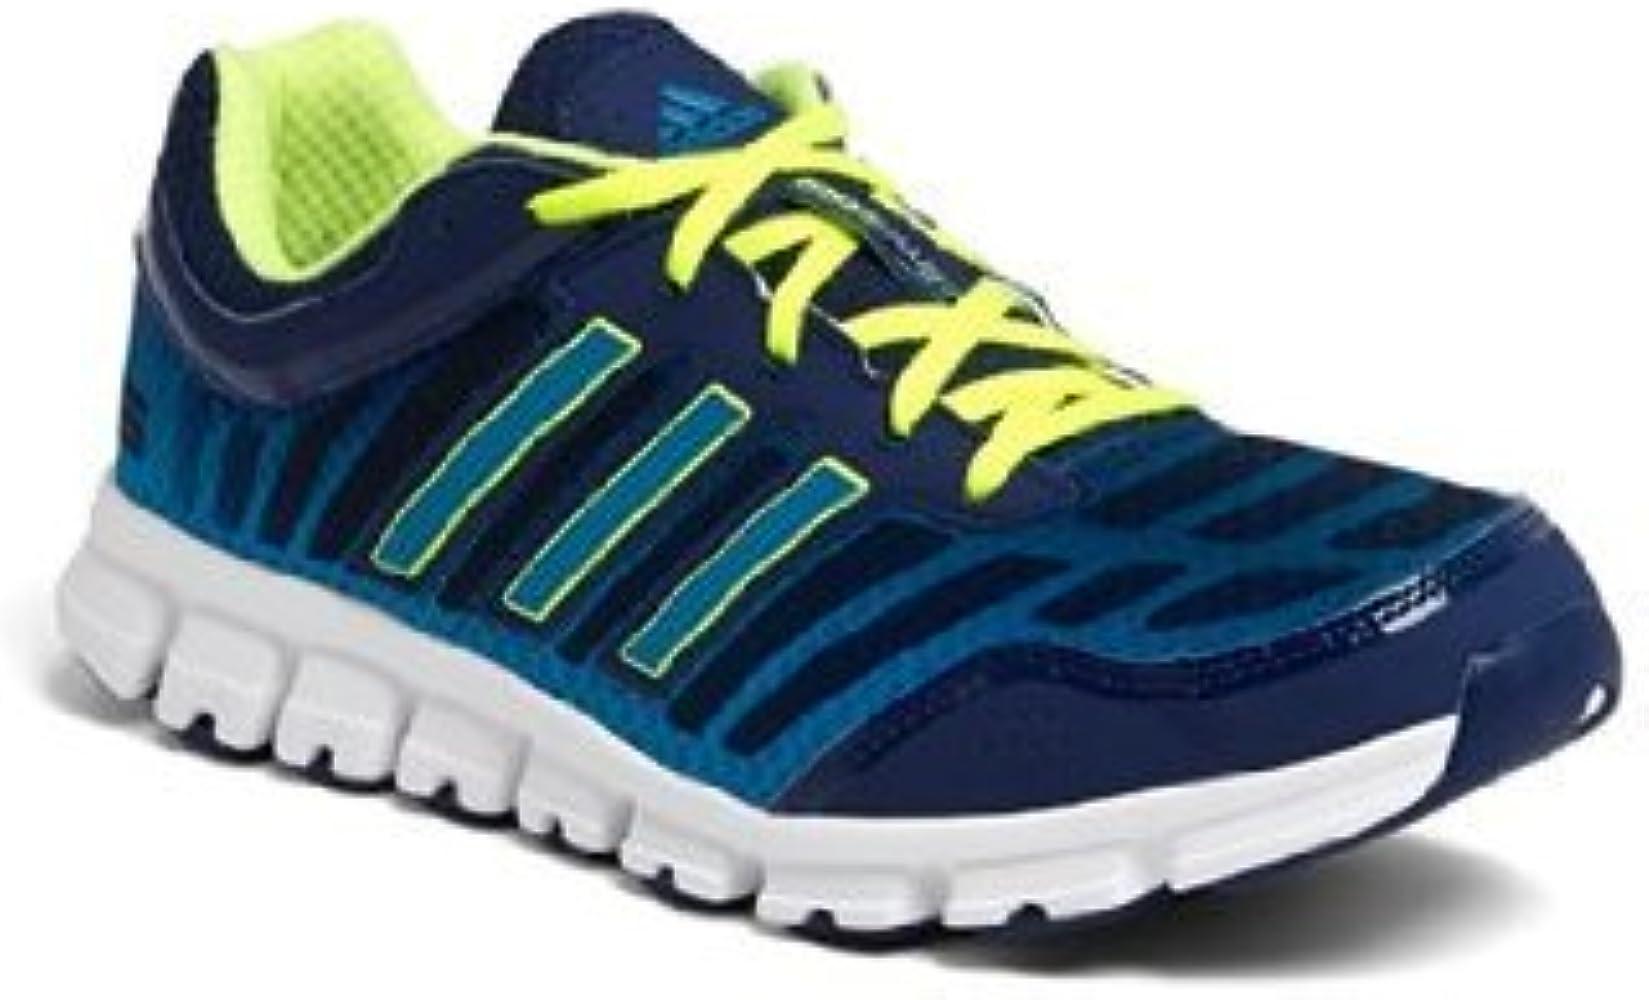 Amazon.com | adidas Men's Climacool Aerate 2.0 Shoes G66657 (14 ...